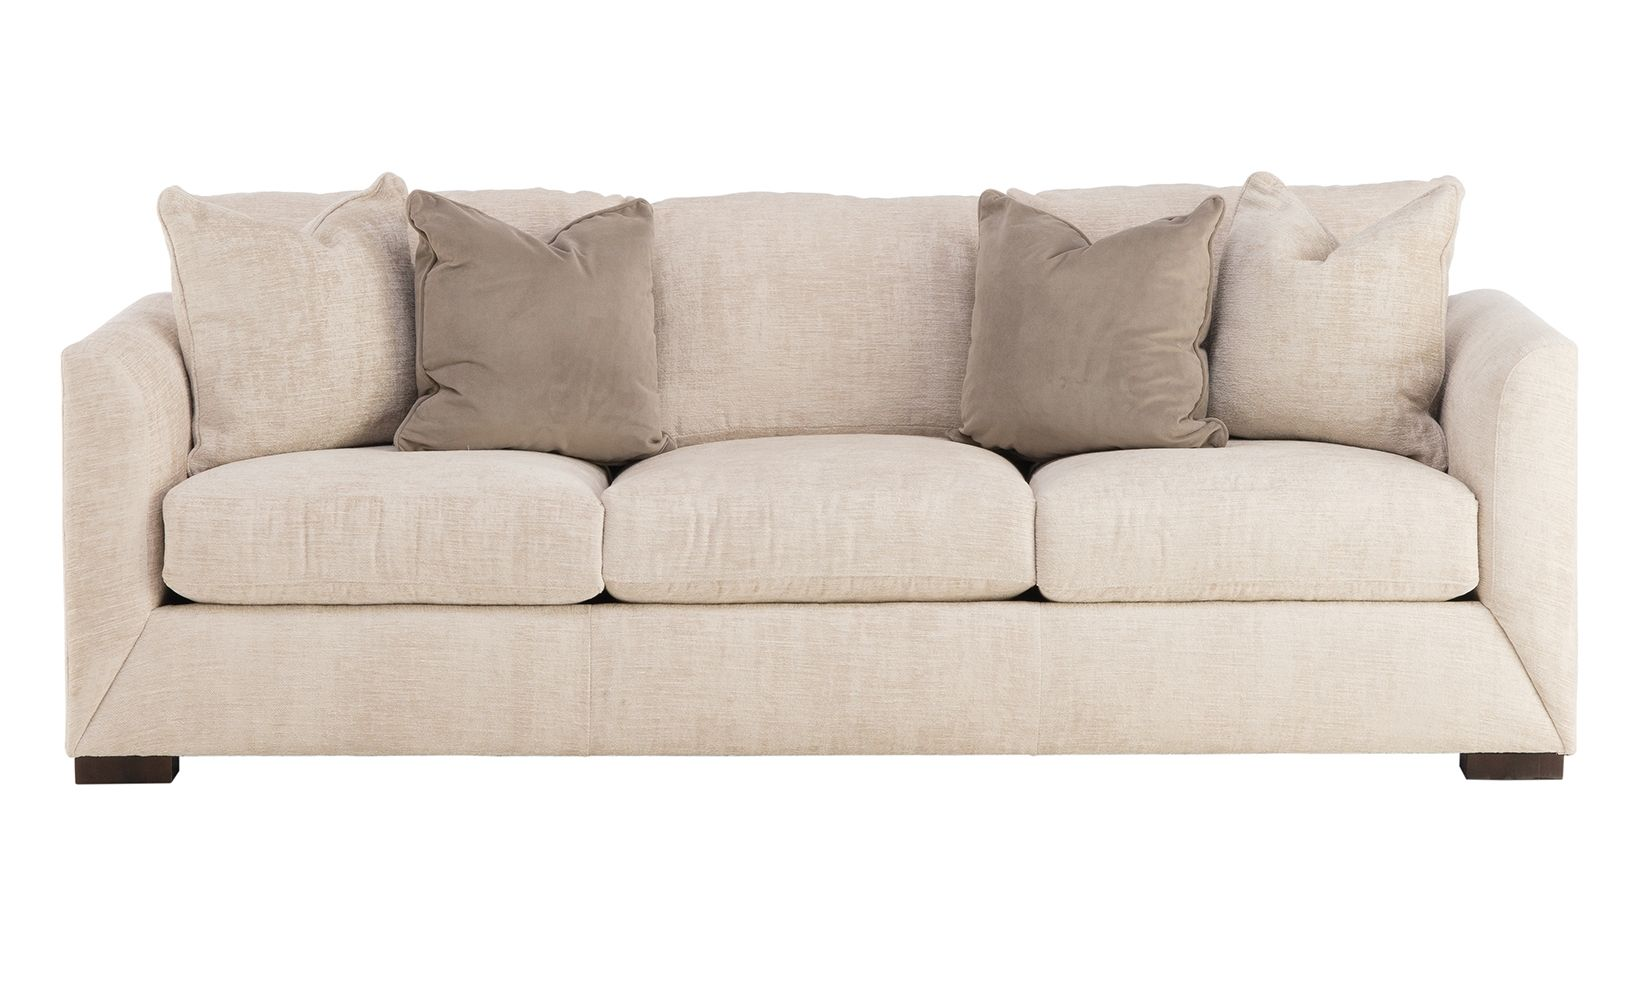 Dalton Ivory Sofa Sofa Love Seat Mid Century Design